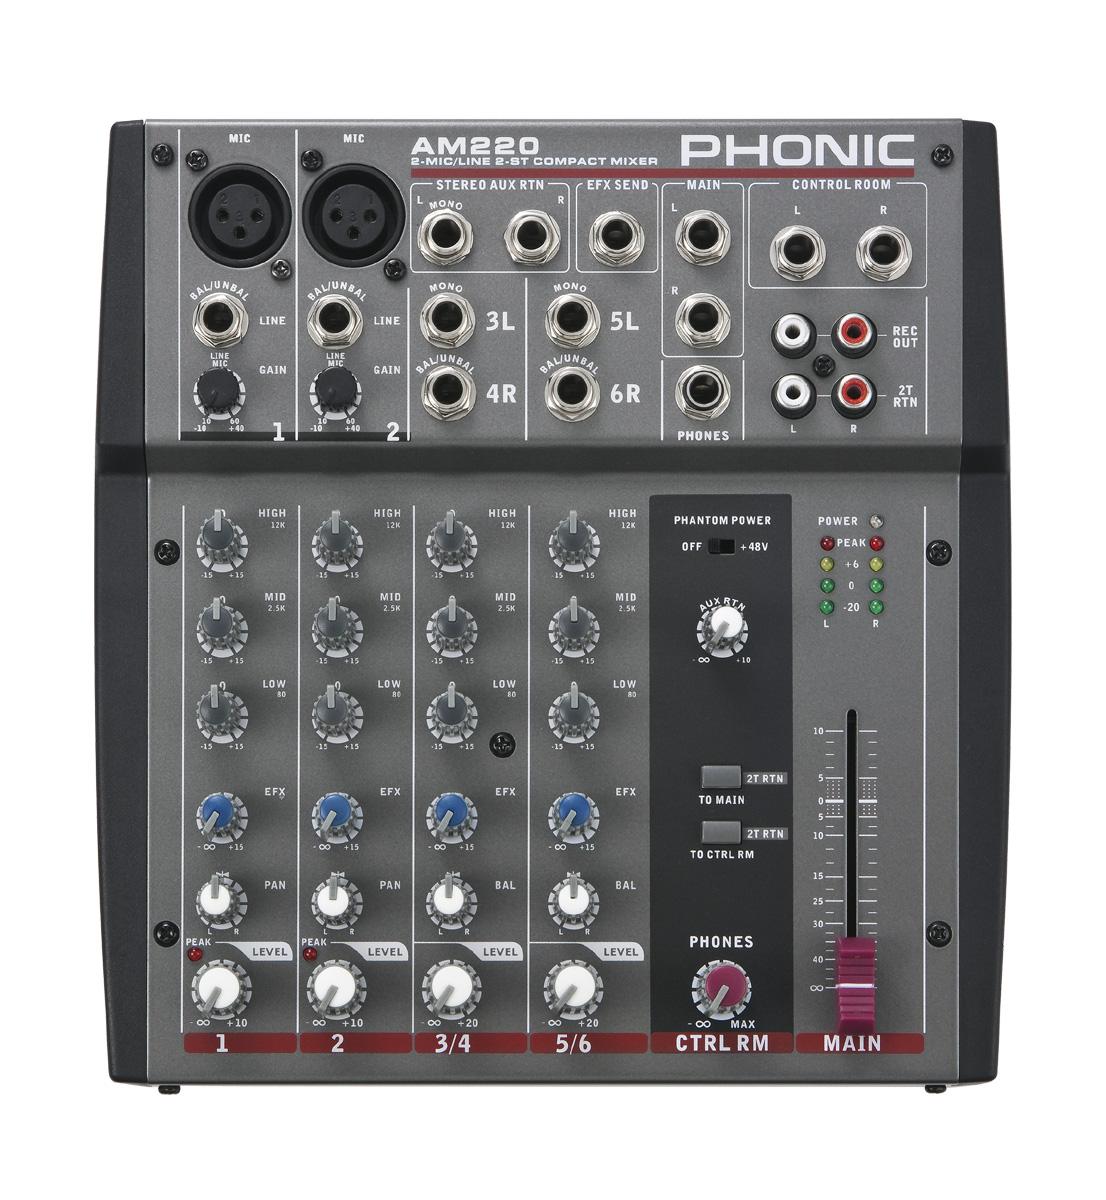 AM220